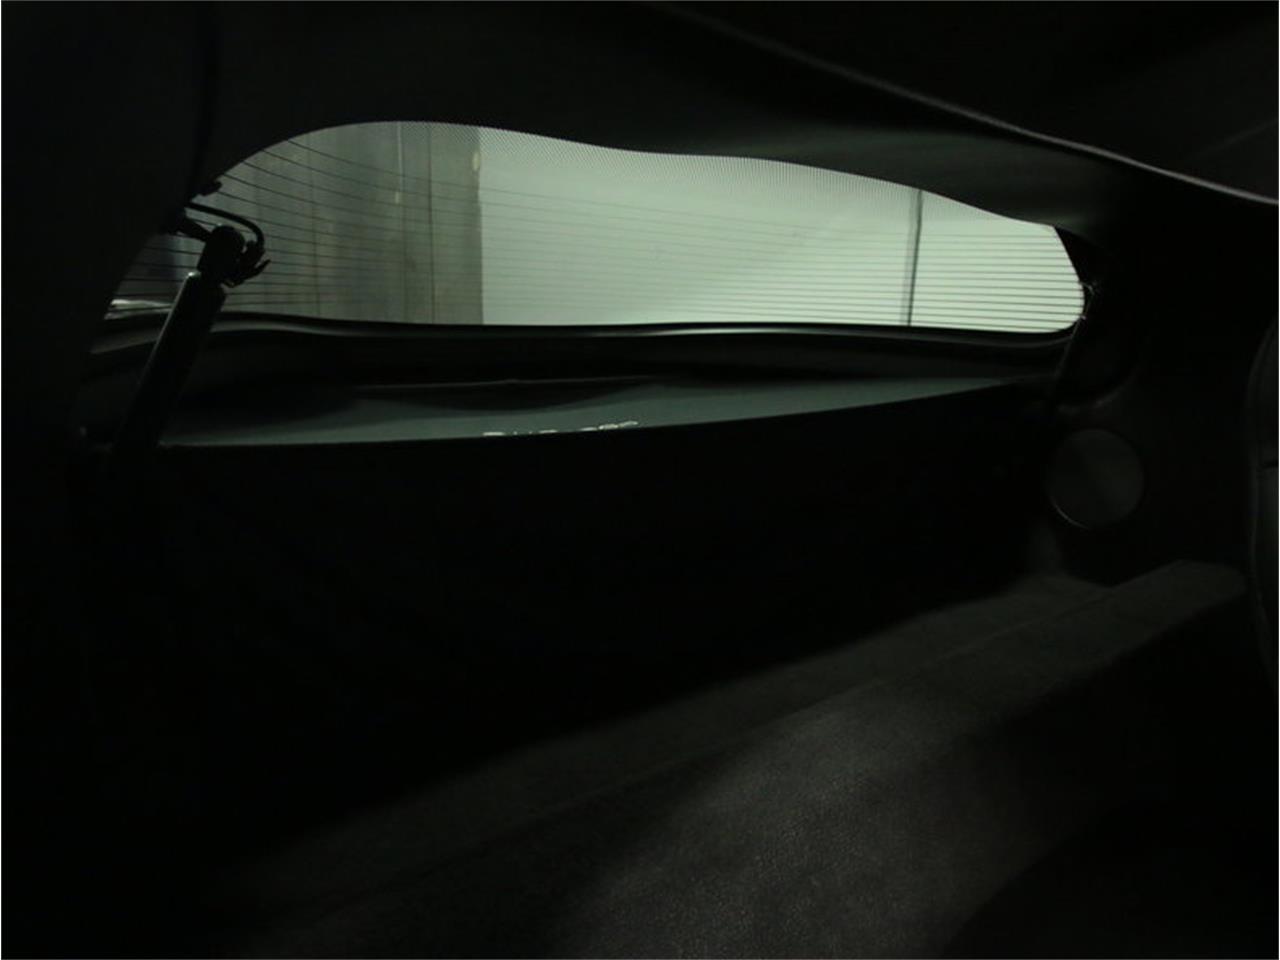 Large Picture of '08 Corvette Z06 - $39,995.00 - J8VS